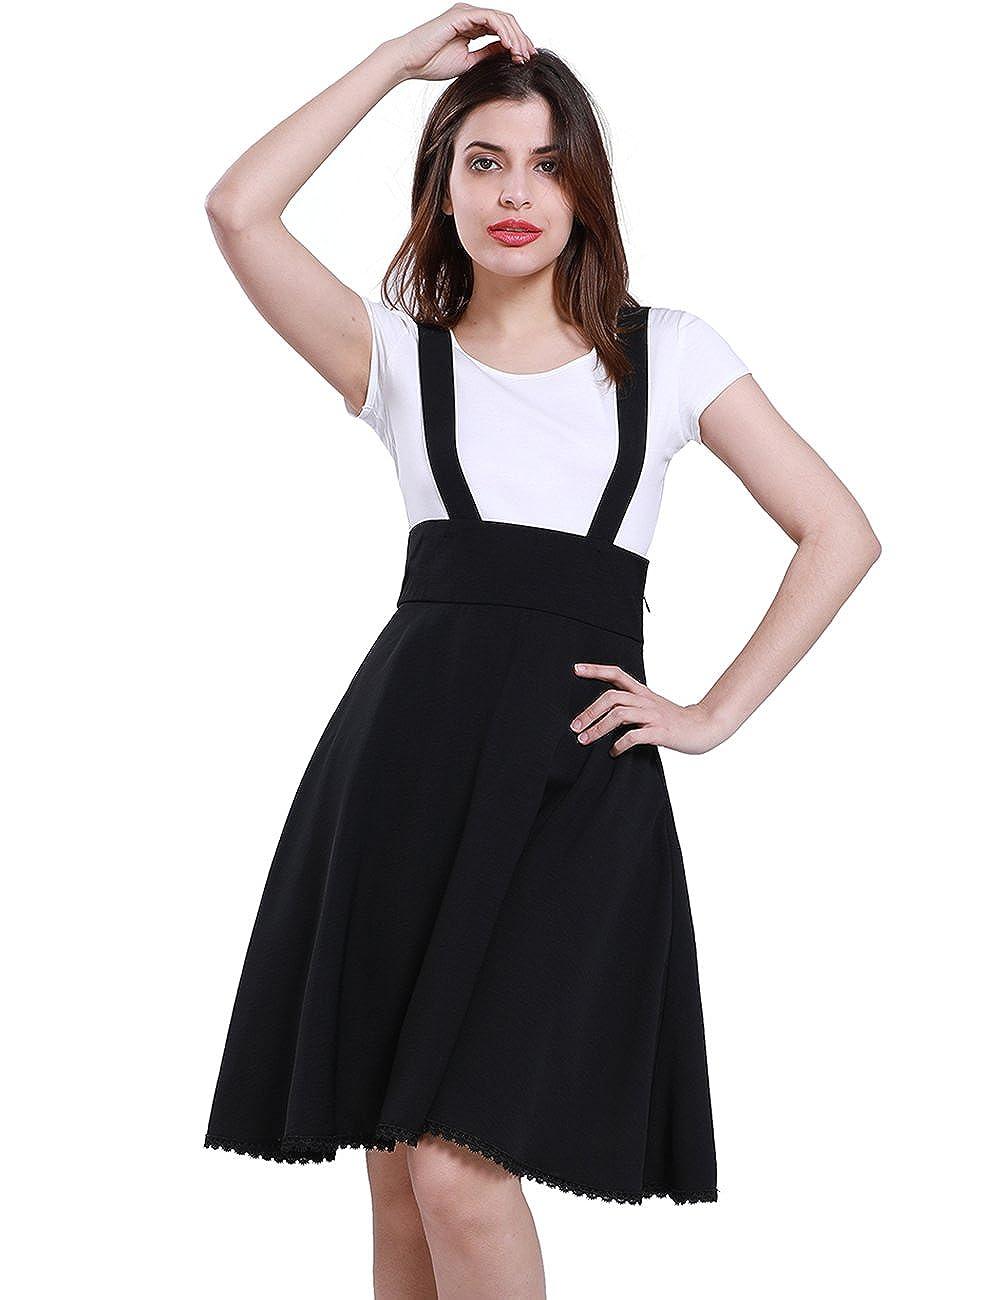 c9927760673 Top 10 wholesale Suspender High Waist Skirt - Chinabrands.com